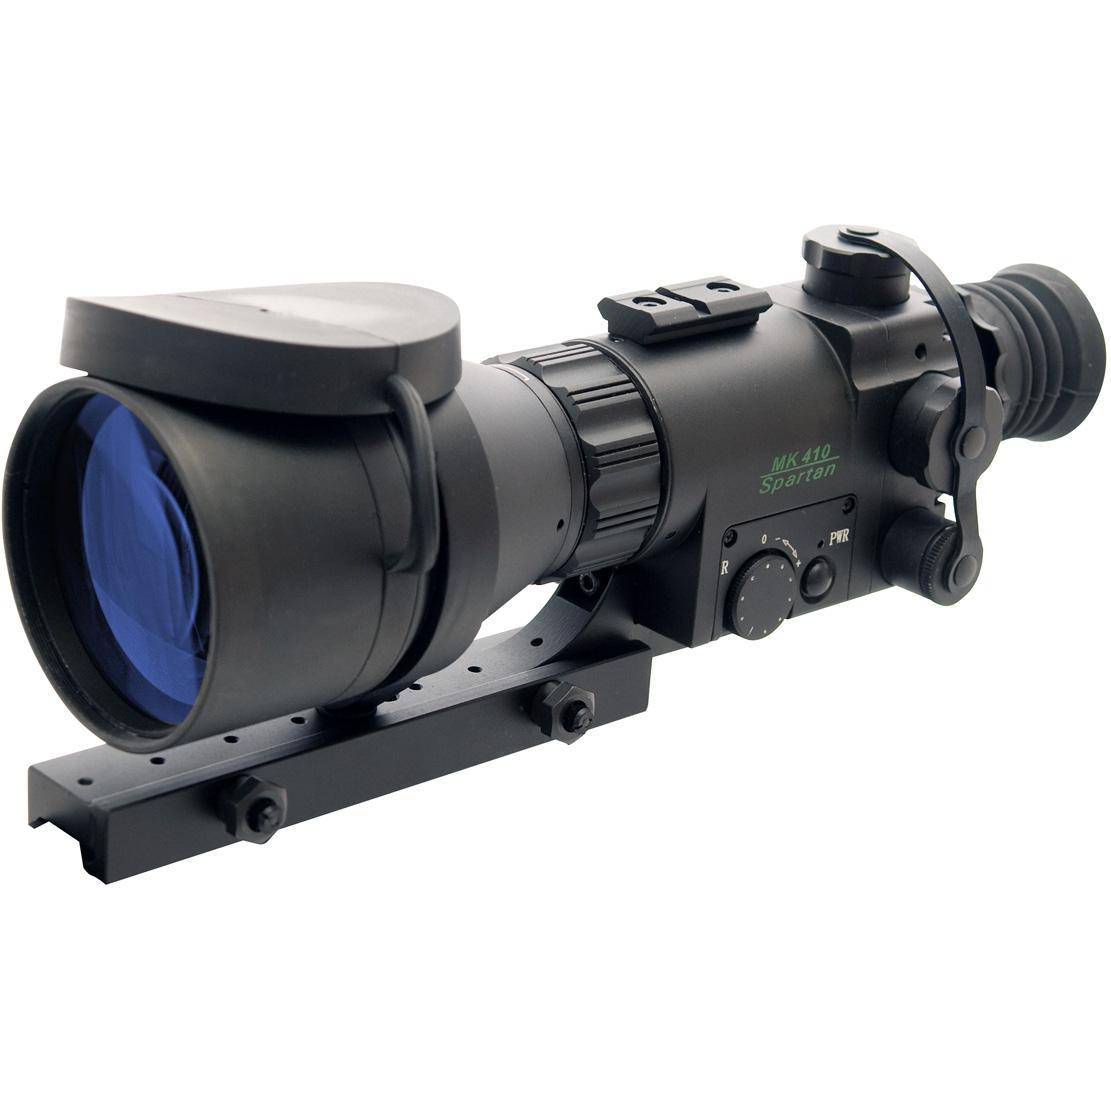 Atn Aries Mk410 Spartan Night Vision Weapon Scope With Gen 1 40 Lp/mm Resolution - Nvwsm41010